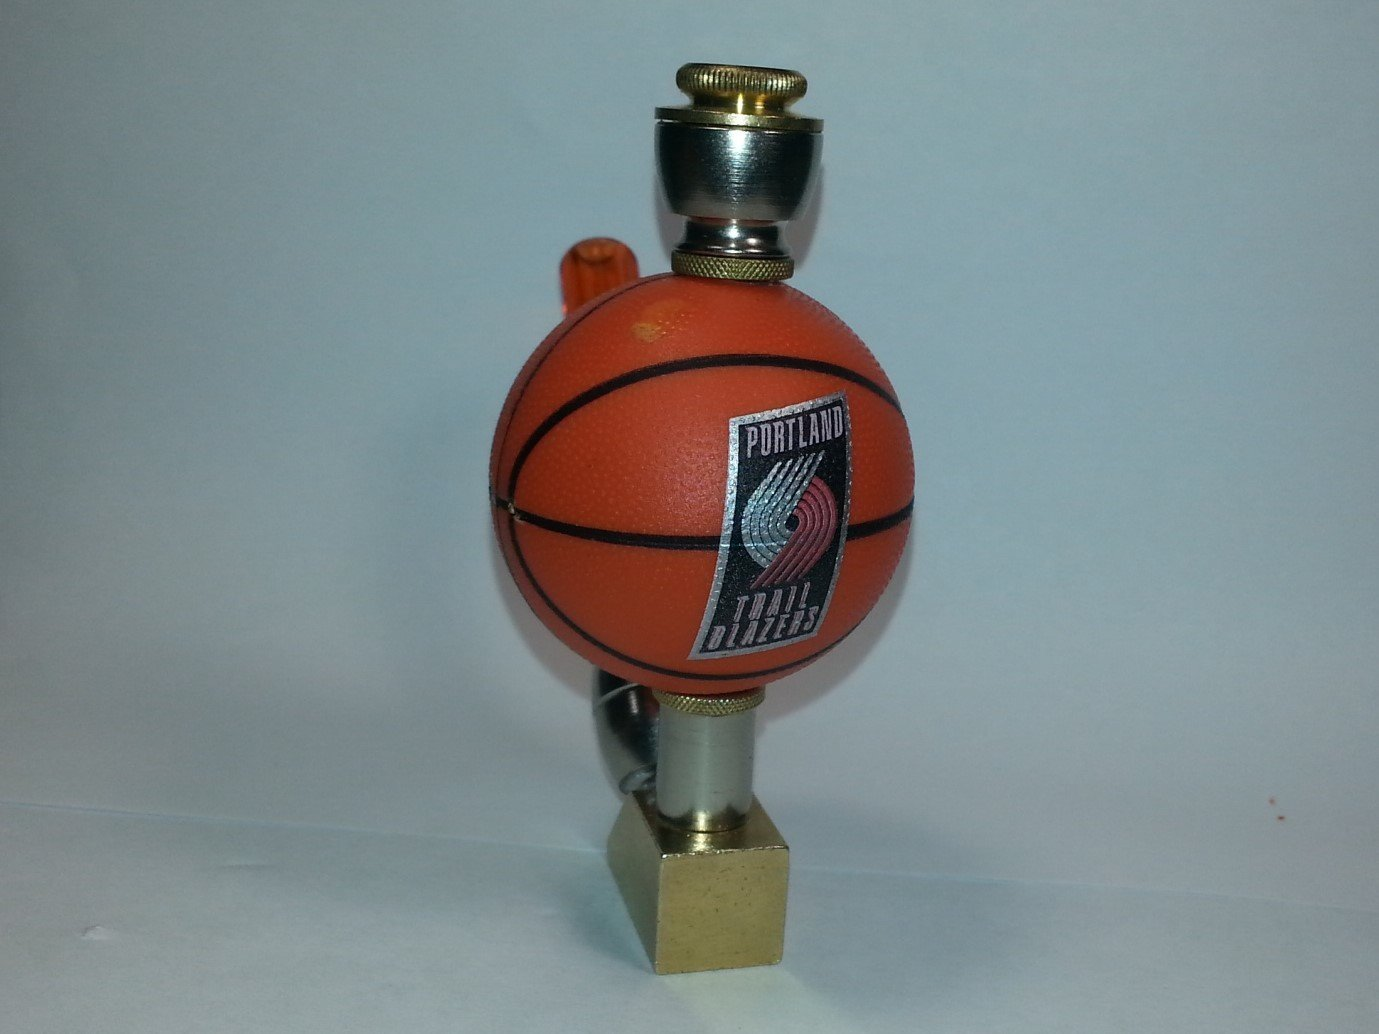 Portland Trail Blazers NBA Basketball Pipe Wedge Design Nickel/Brass Finish